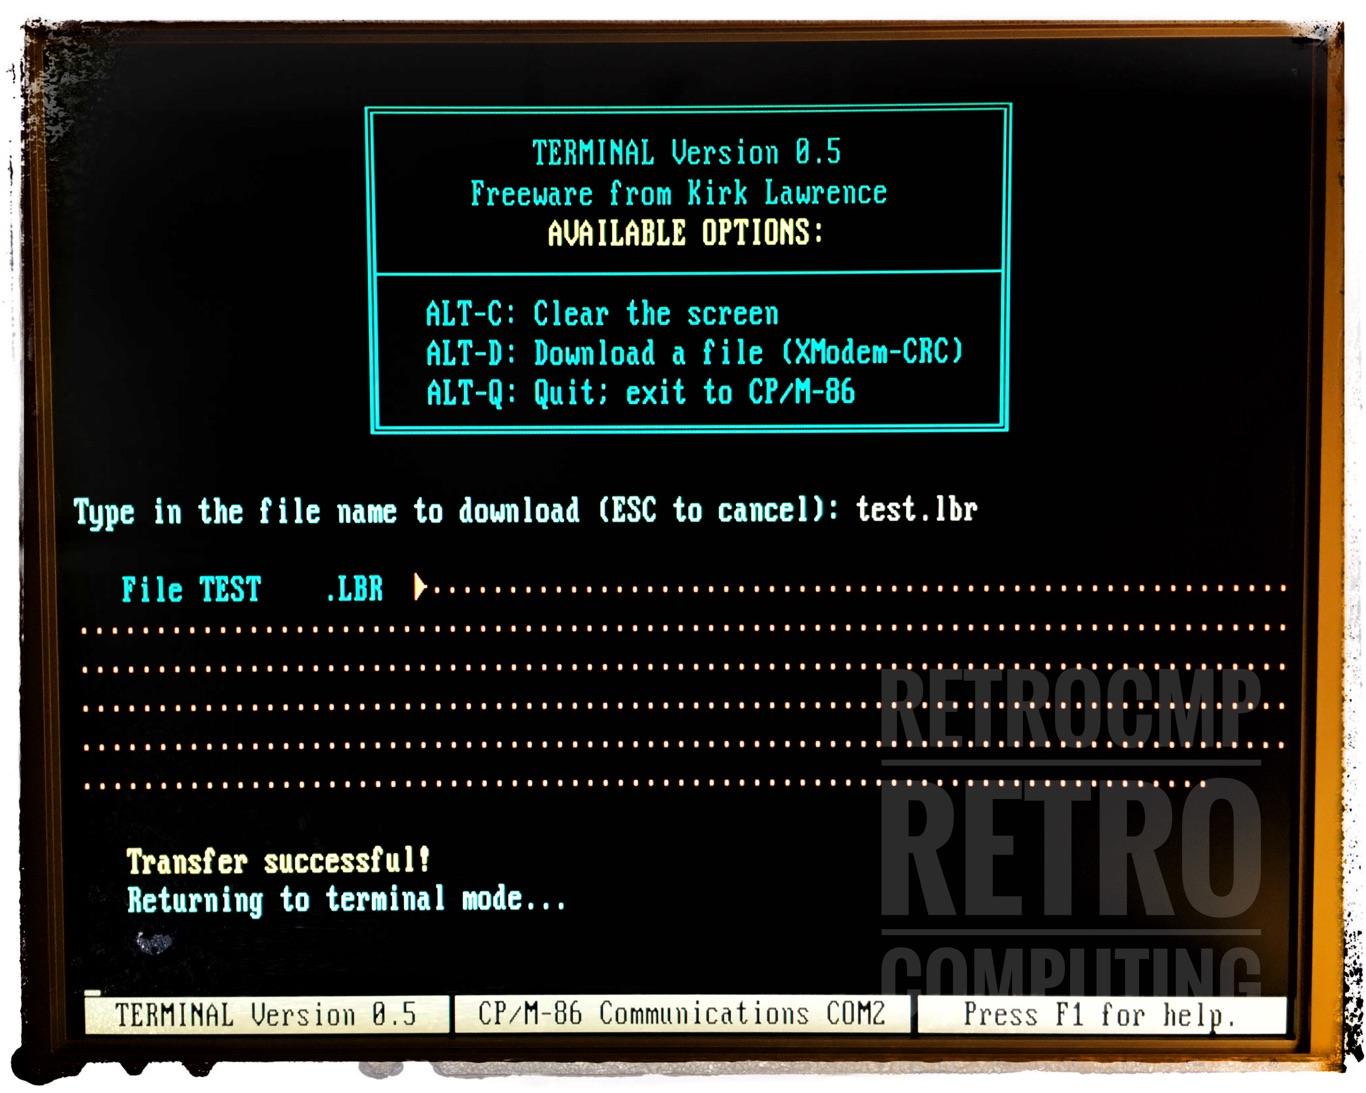 File transfer / CP/M-86 / TERMINAL // retrocmp / retro computing